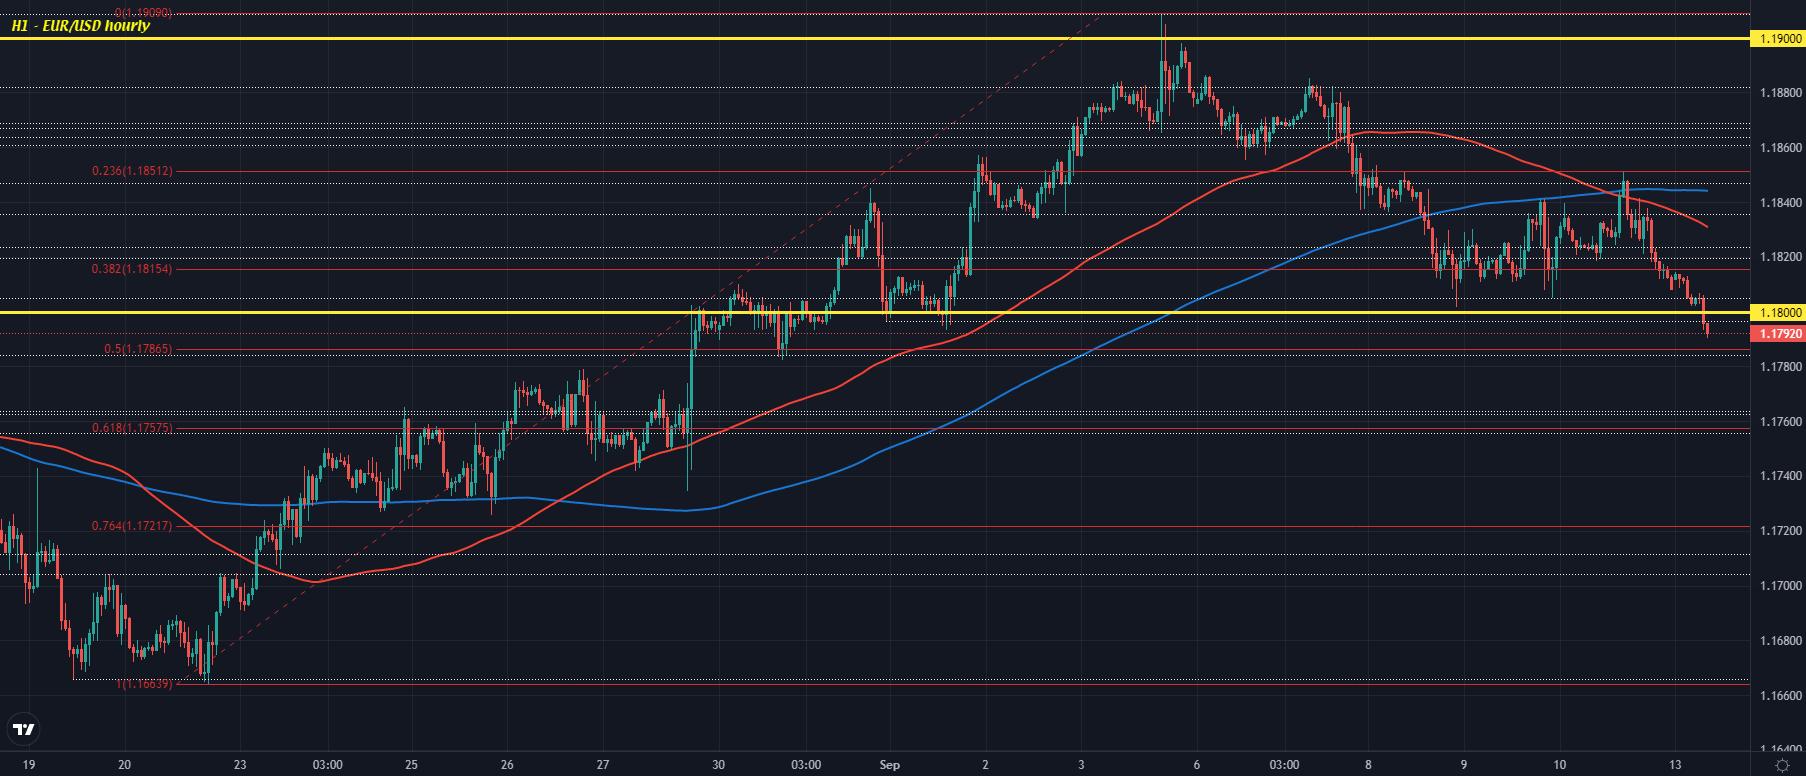 Dollar gains slight edge going into European trading